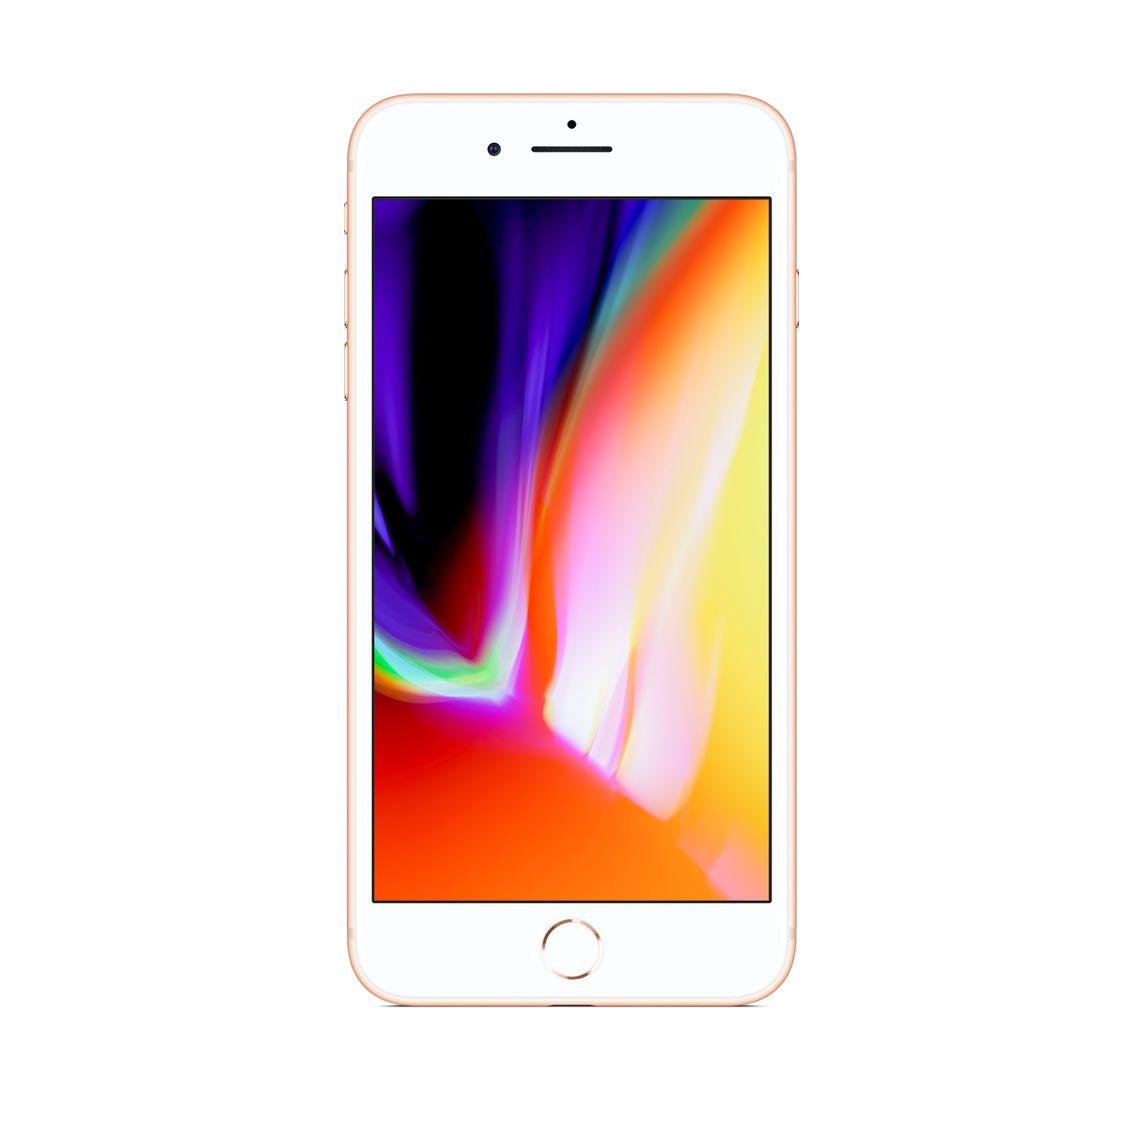 Refurbished Iphone 8 Plus 64gb Gold Unlocked